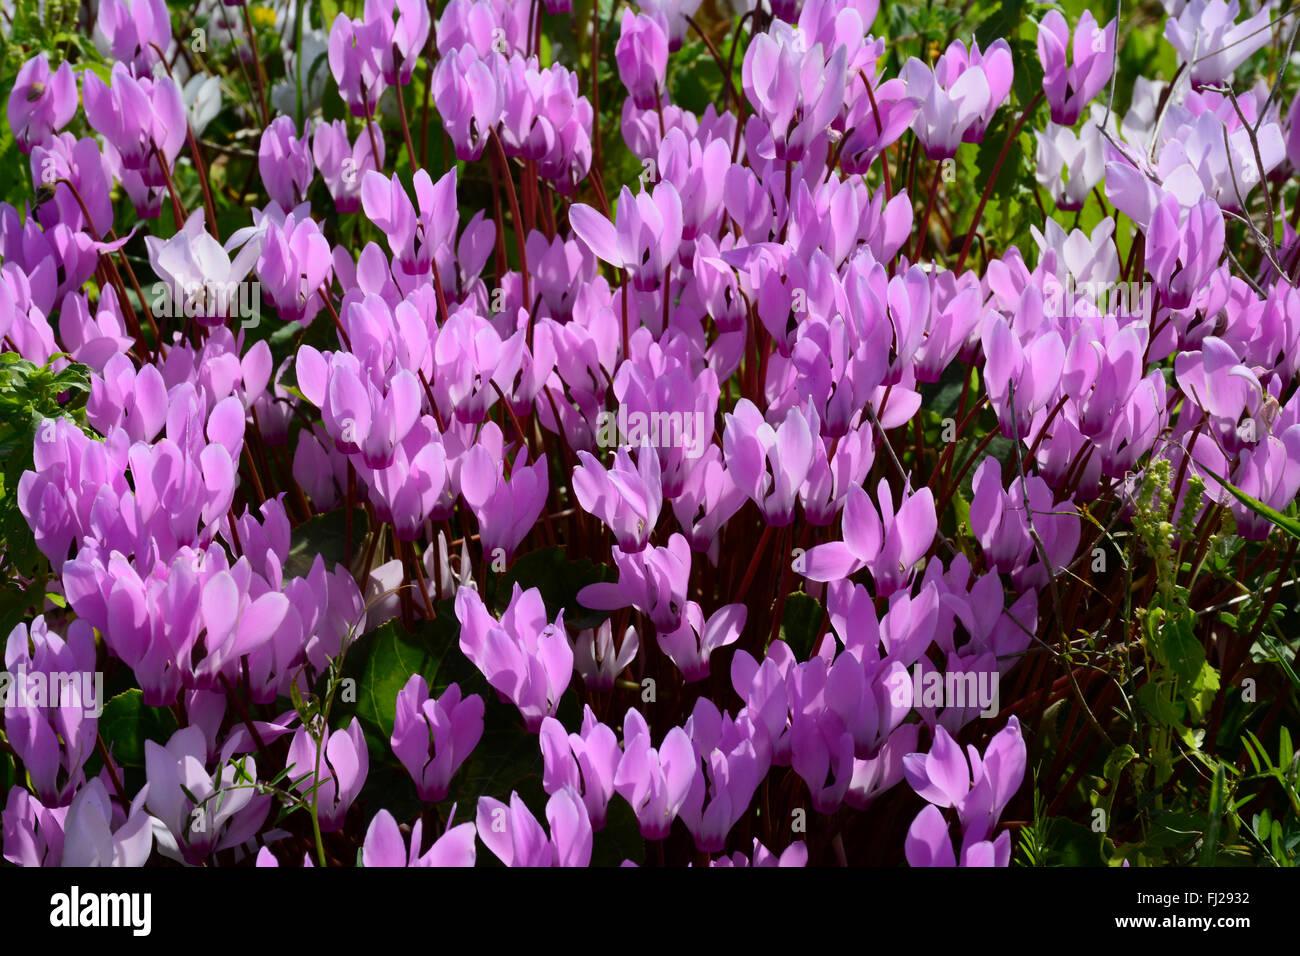 Cyclamen flower carpet - Stock Image